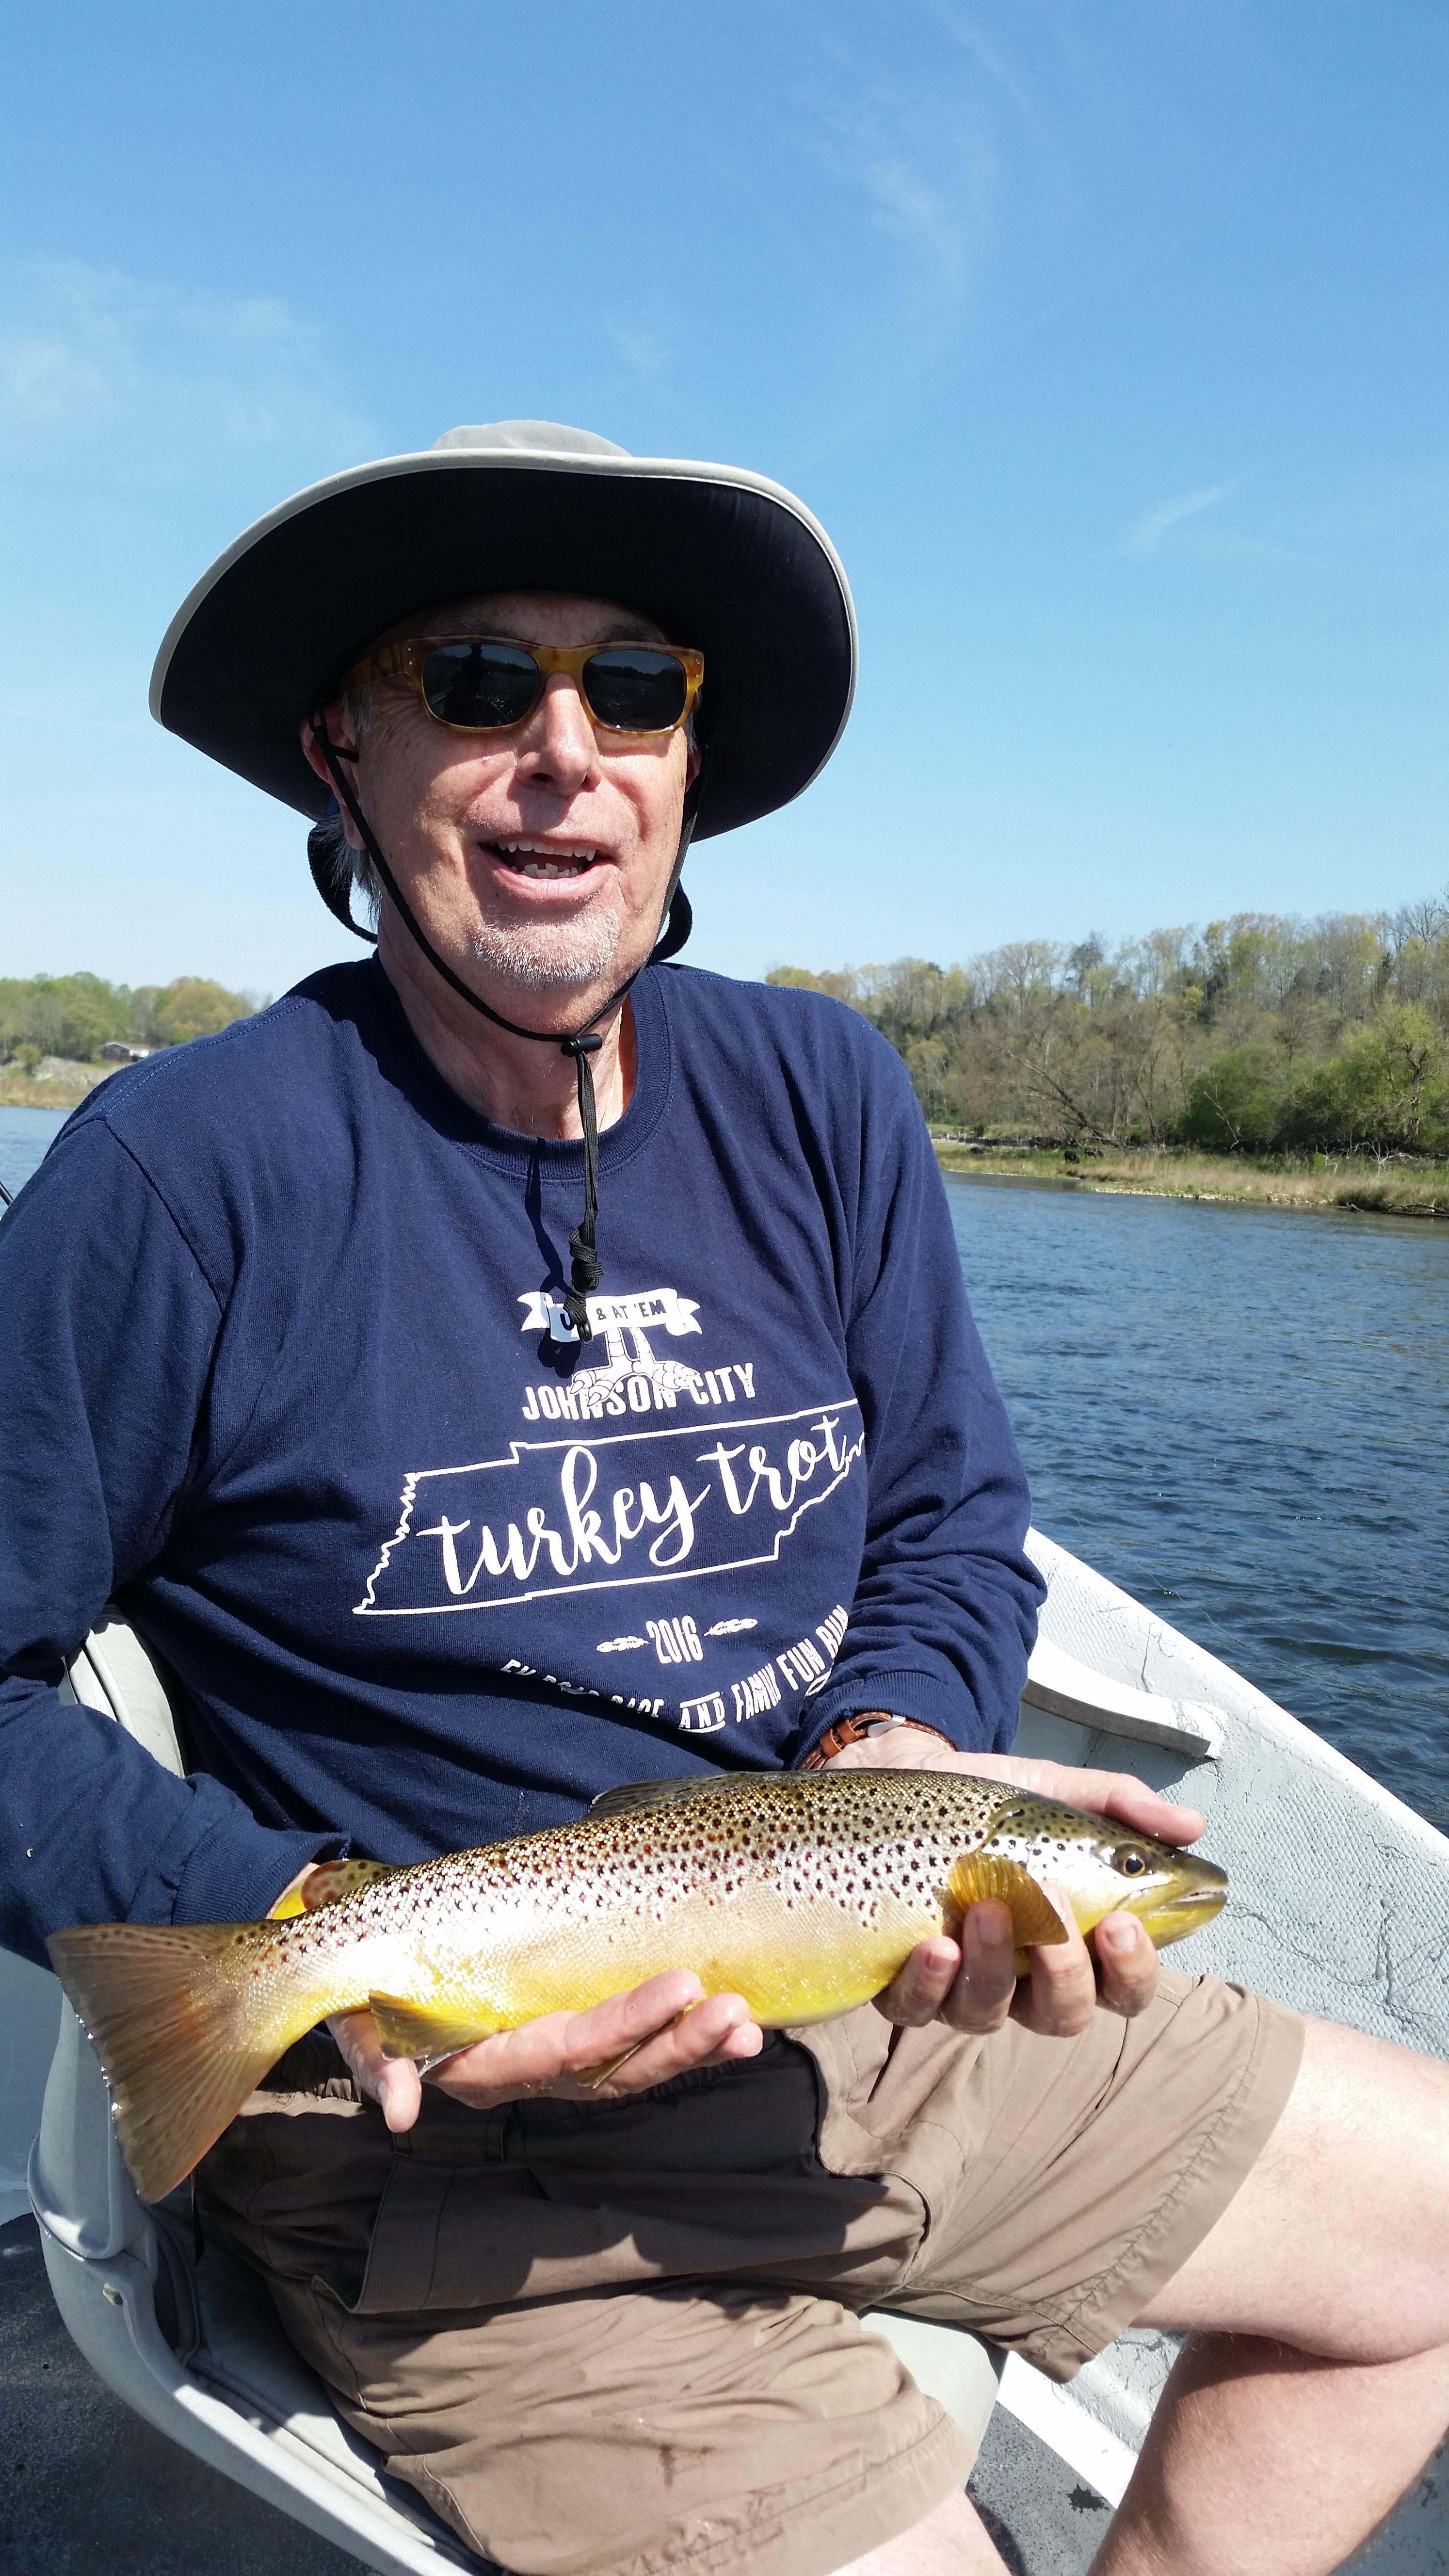 Wild Watauga river brown trout